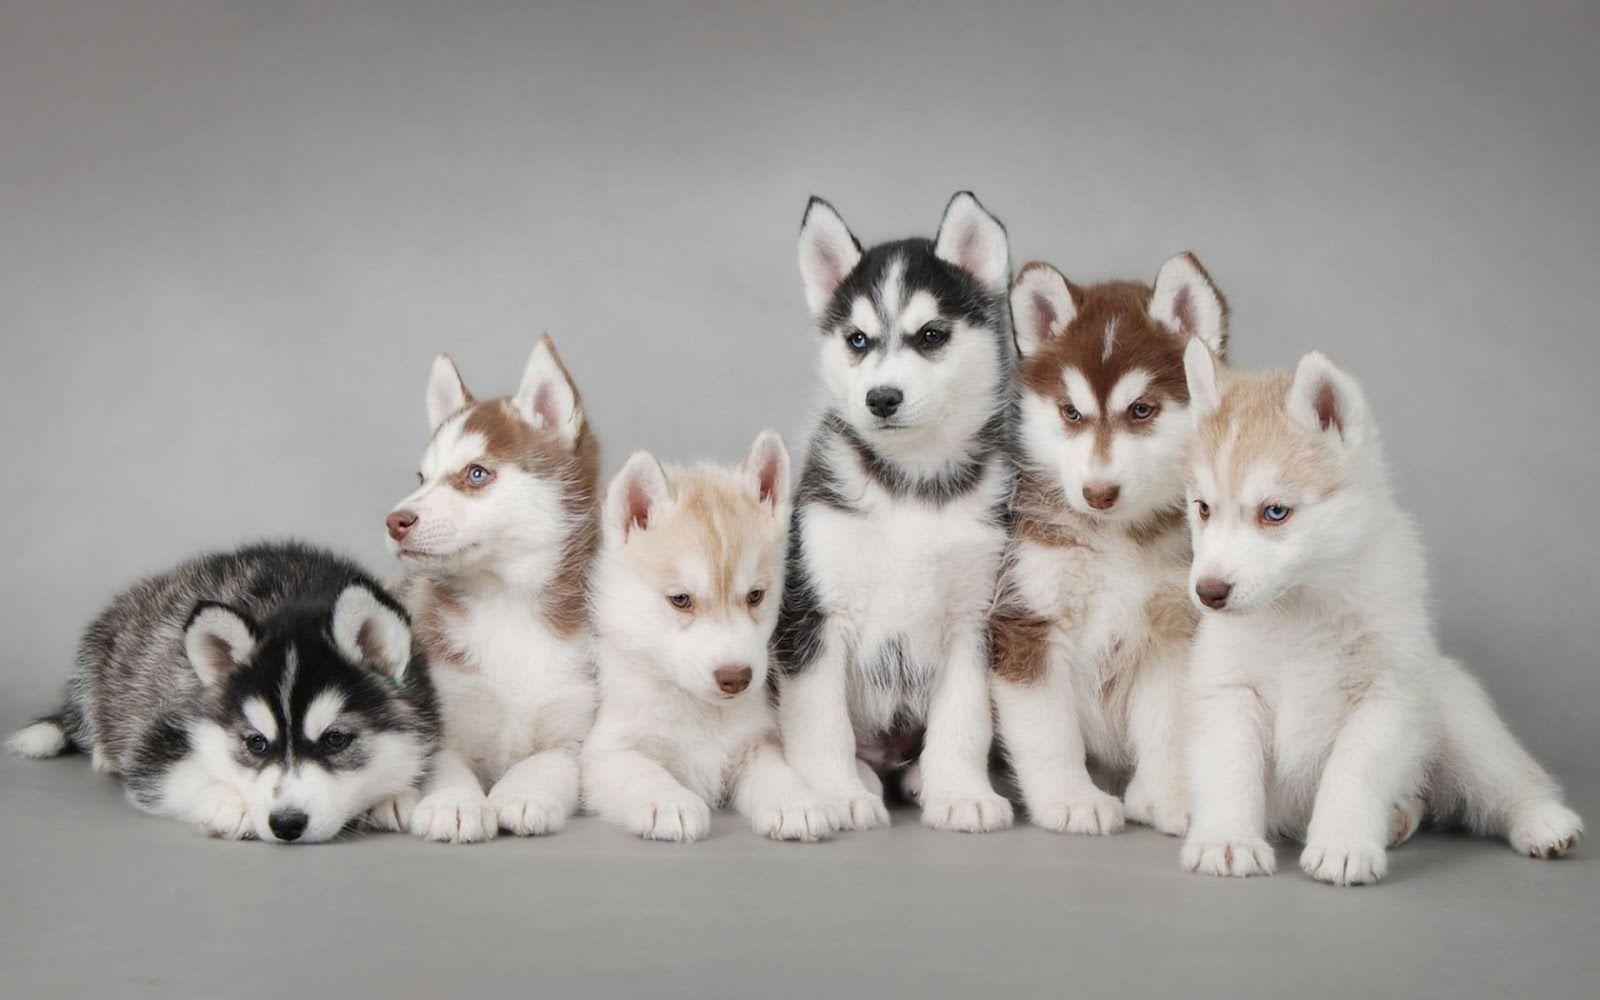 Siberian Husky Puppies Wallpaper Hd 1080p Cute Husky Puppies